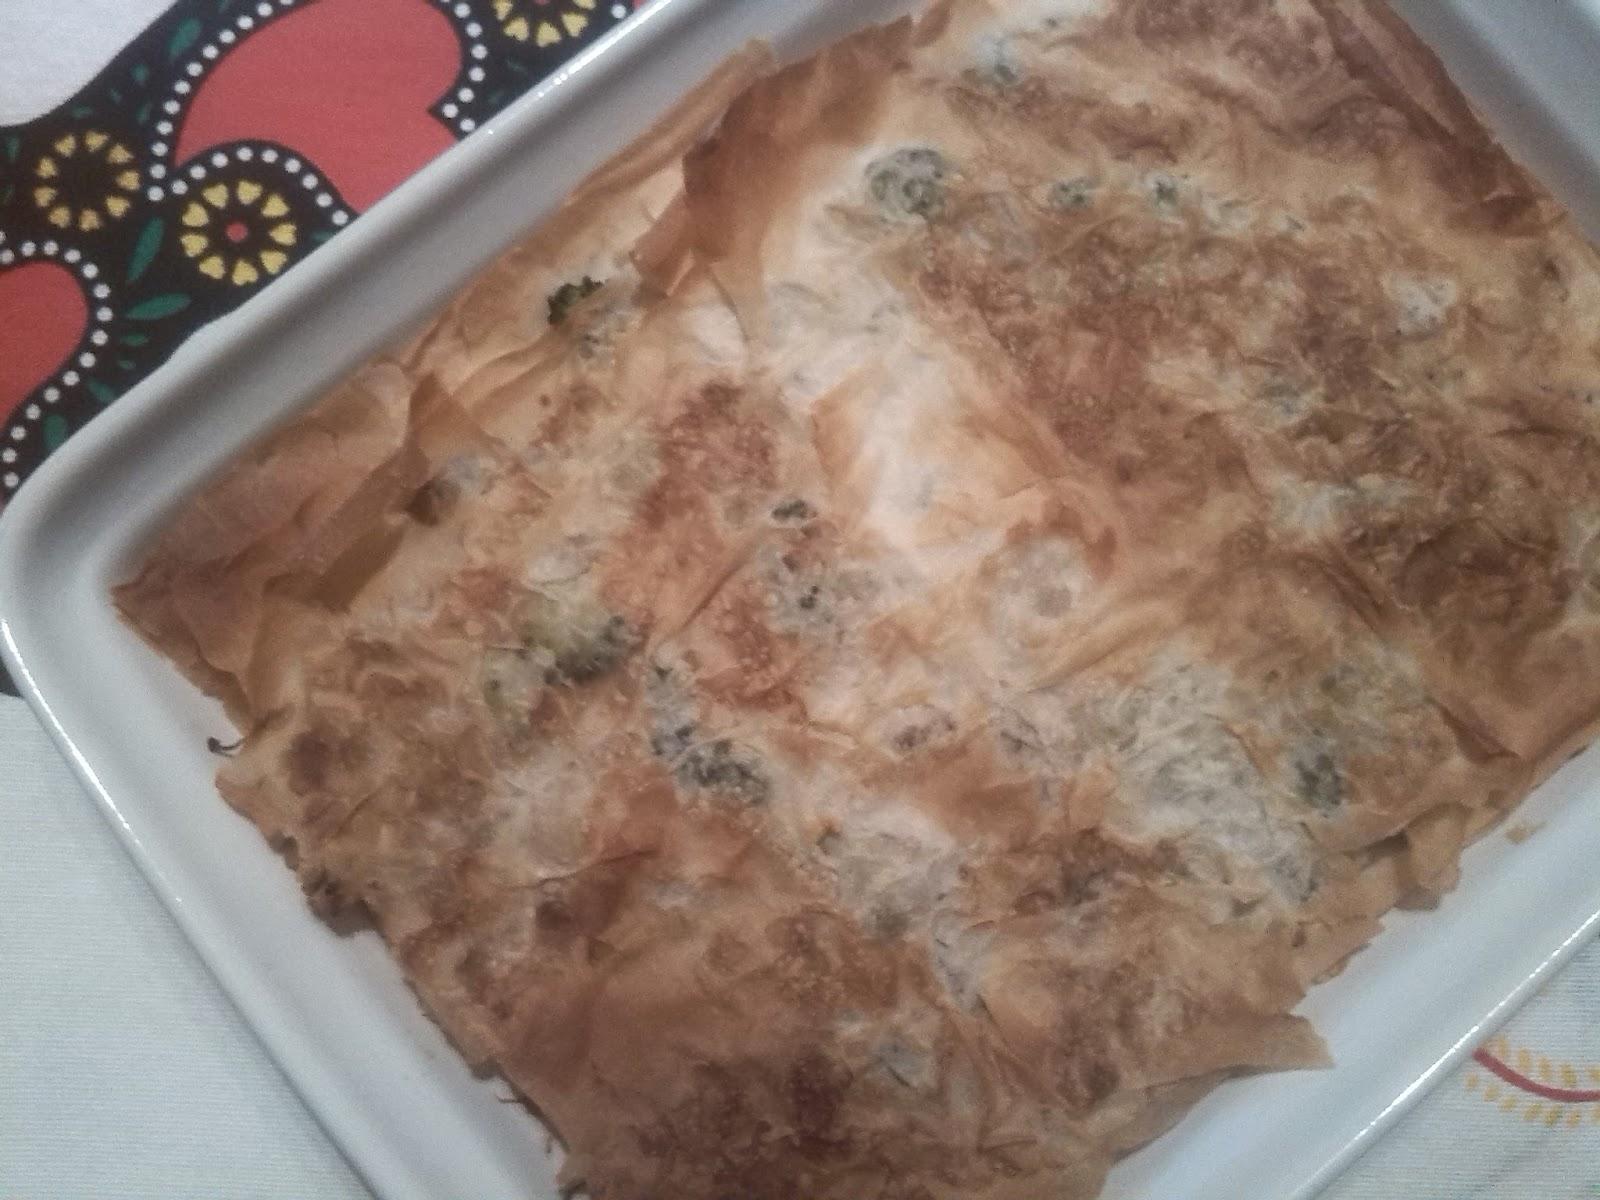 http://lashermanasyunamarx.blogspot.com.es/2014/08/milhojas-o-lasagna-de-pasta-filo.html